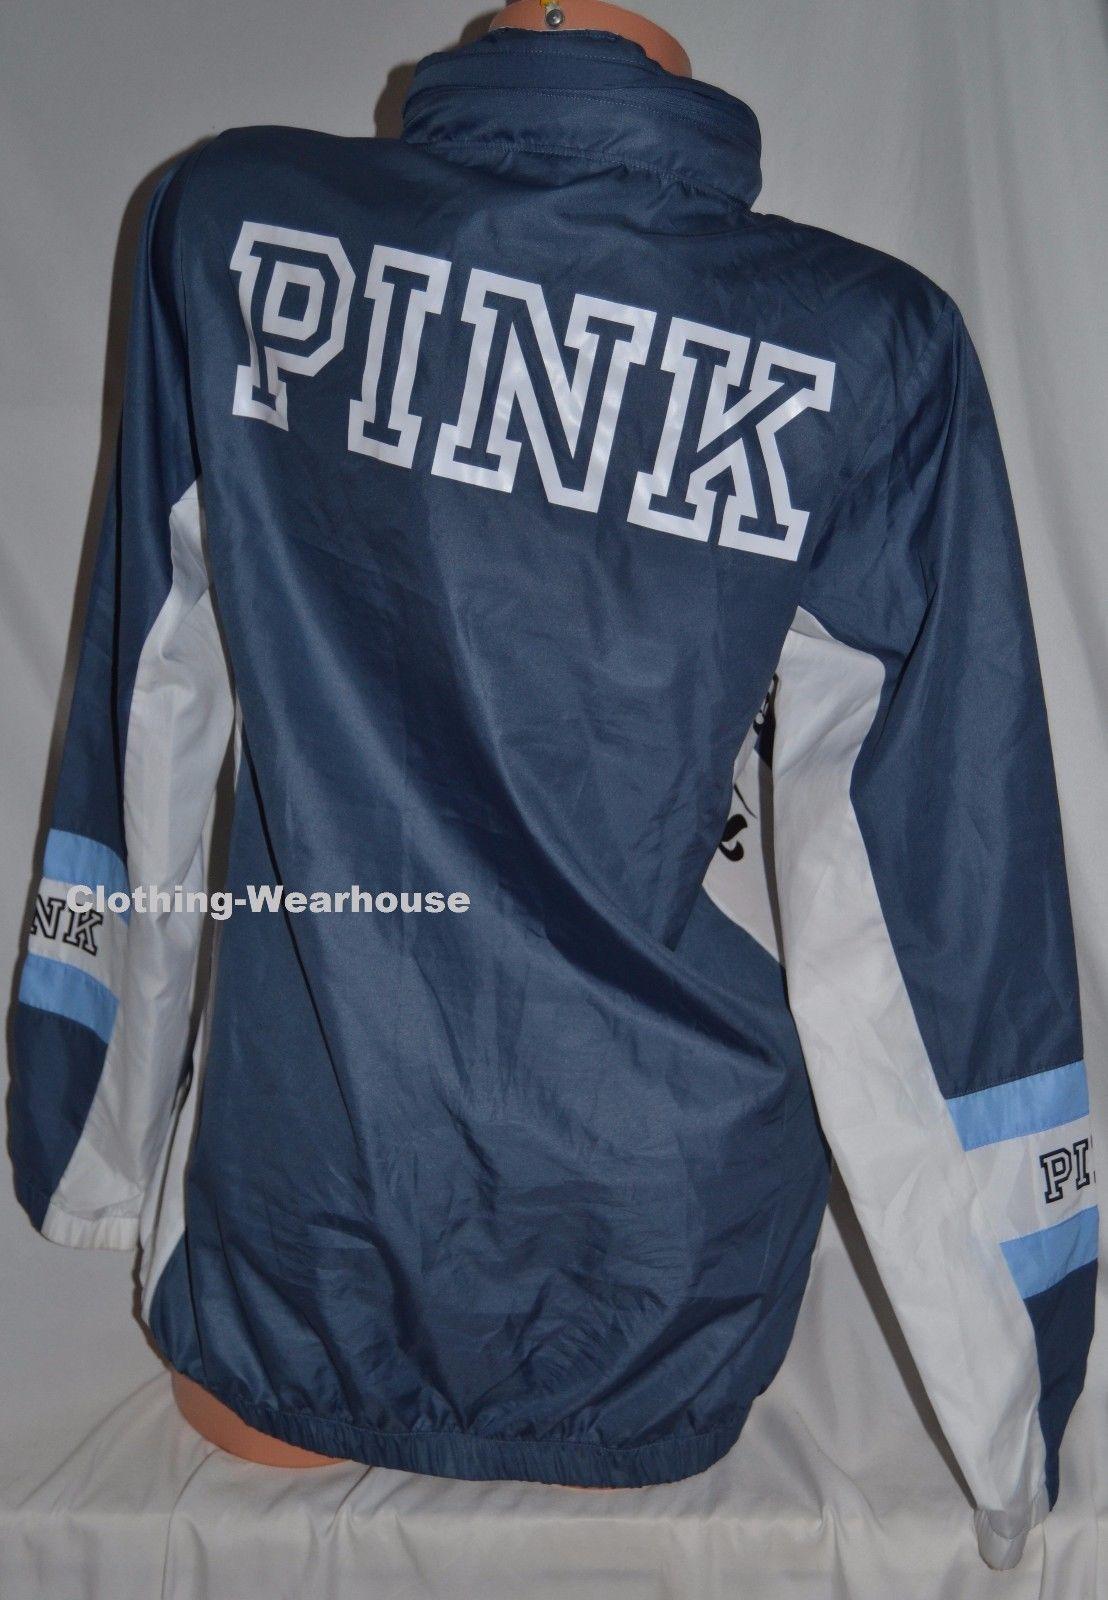 dad72c997d8e1 Victoria's Secret PINK Anorak Full Zip and 50 similar items